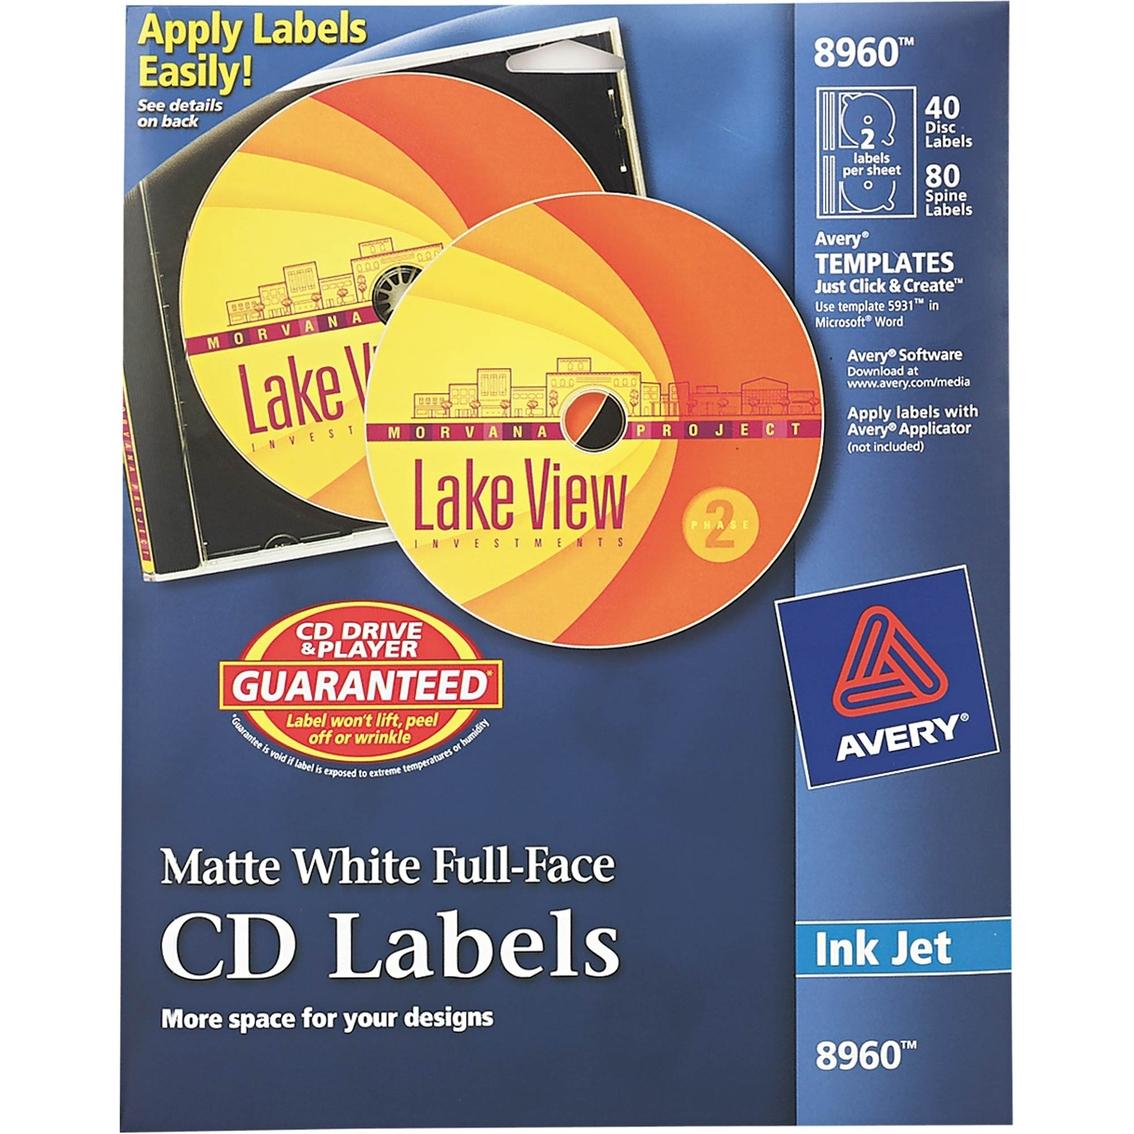 avery inkjet full face cd label 40 pk labels label makers